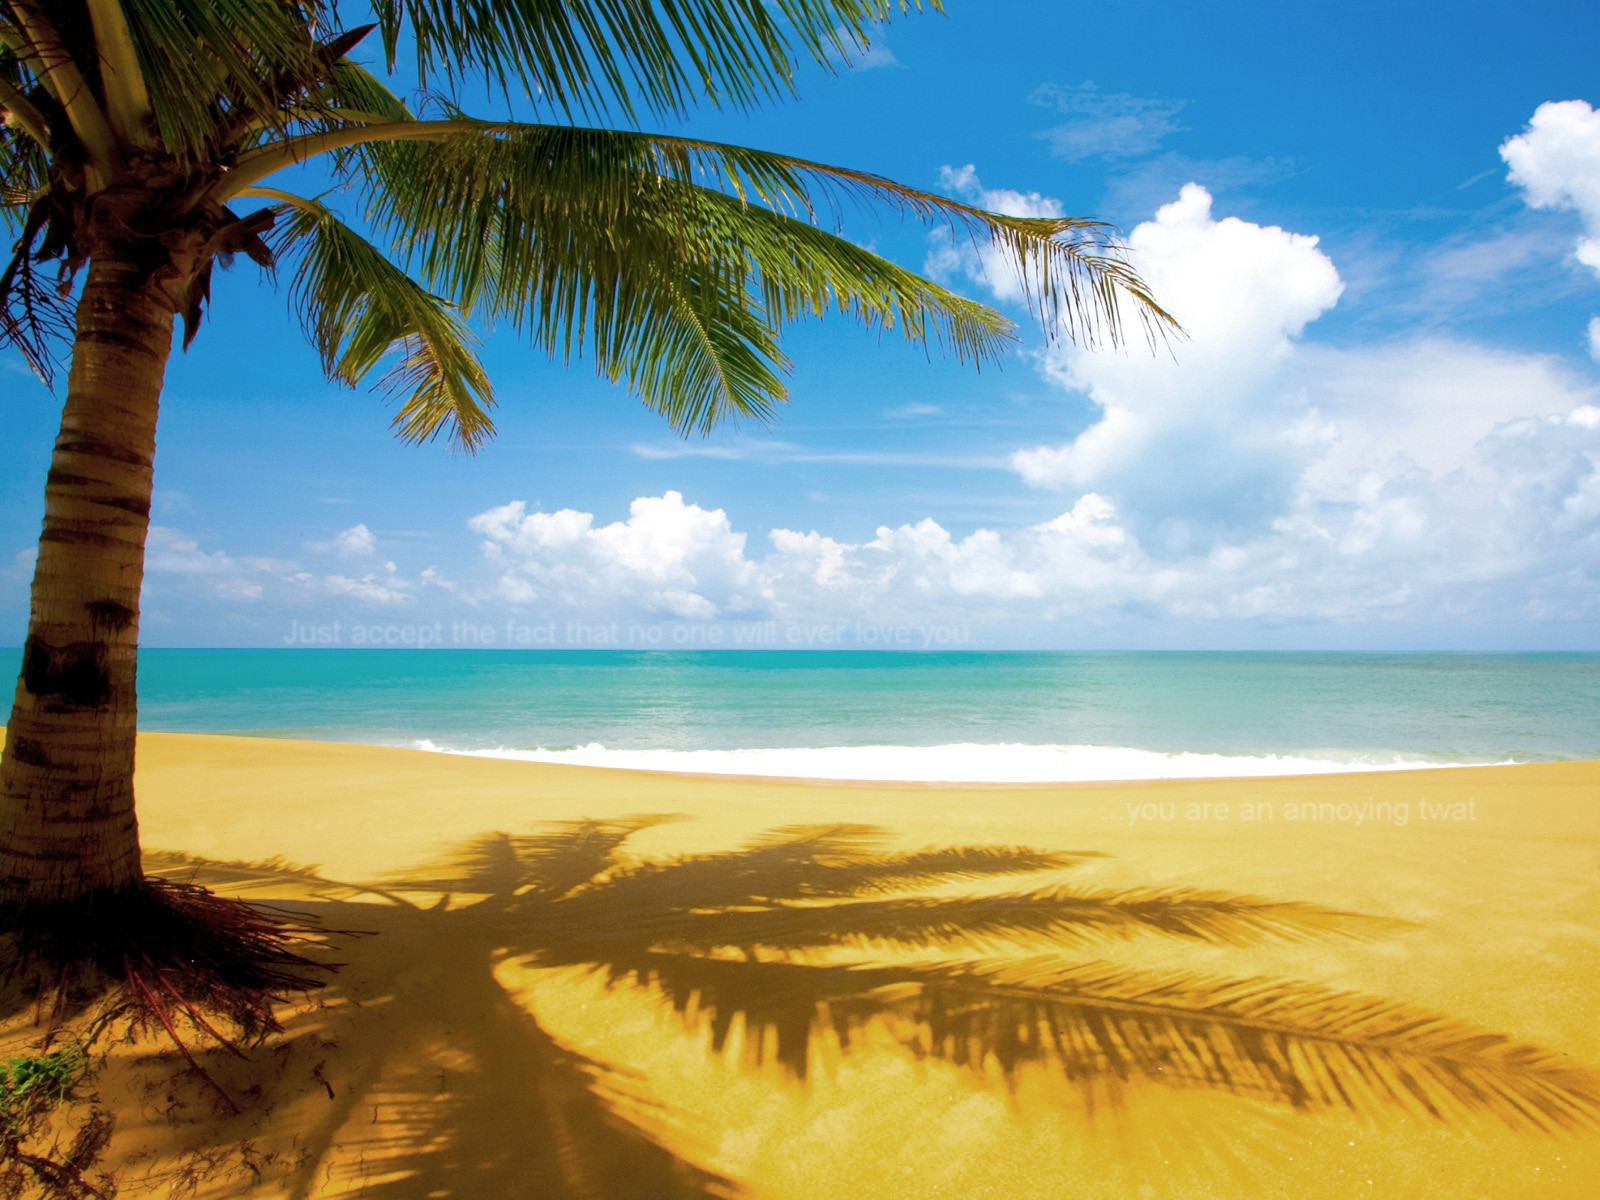 Beautiful Beach Scenes Wallpaper - WallpaperSafari - photo#13